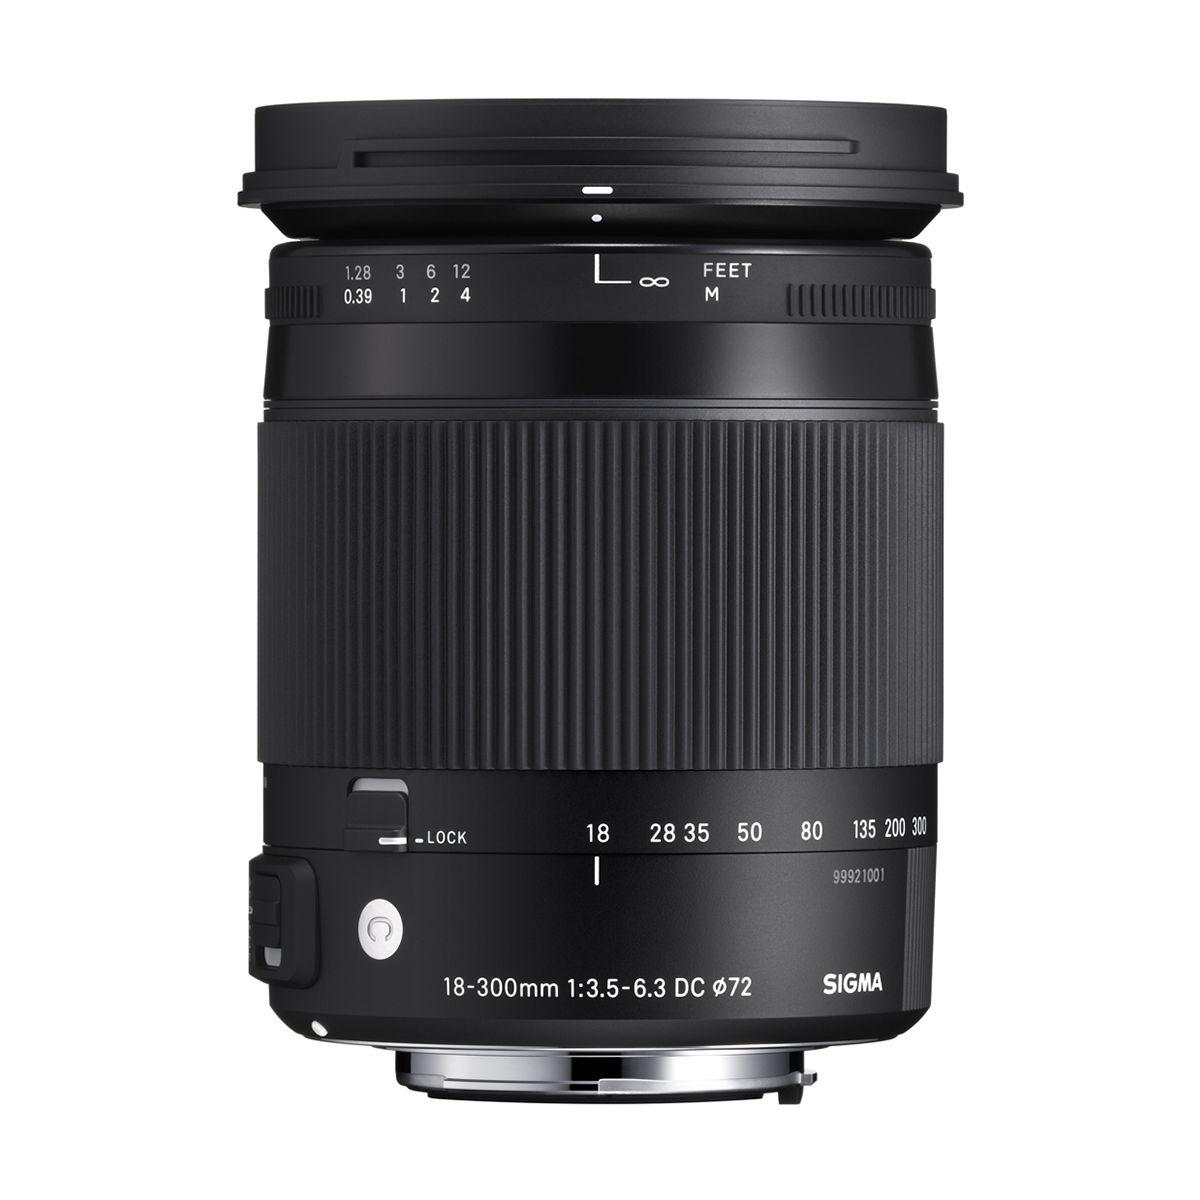 Objectif pour Reflex SIGMA 18-300mm f/3.5-6.3 Macro DC HSM Pen...